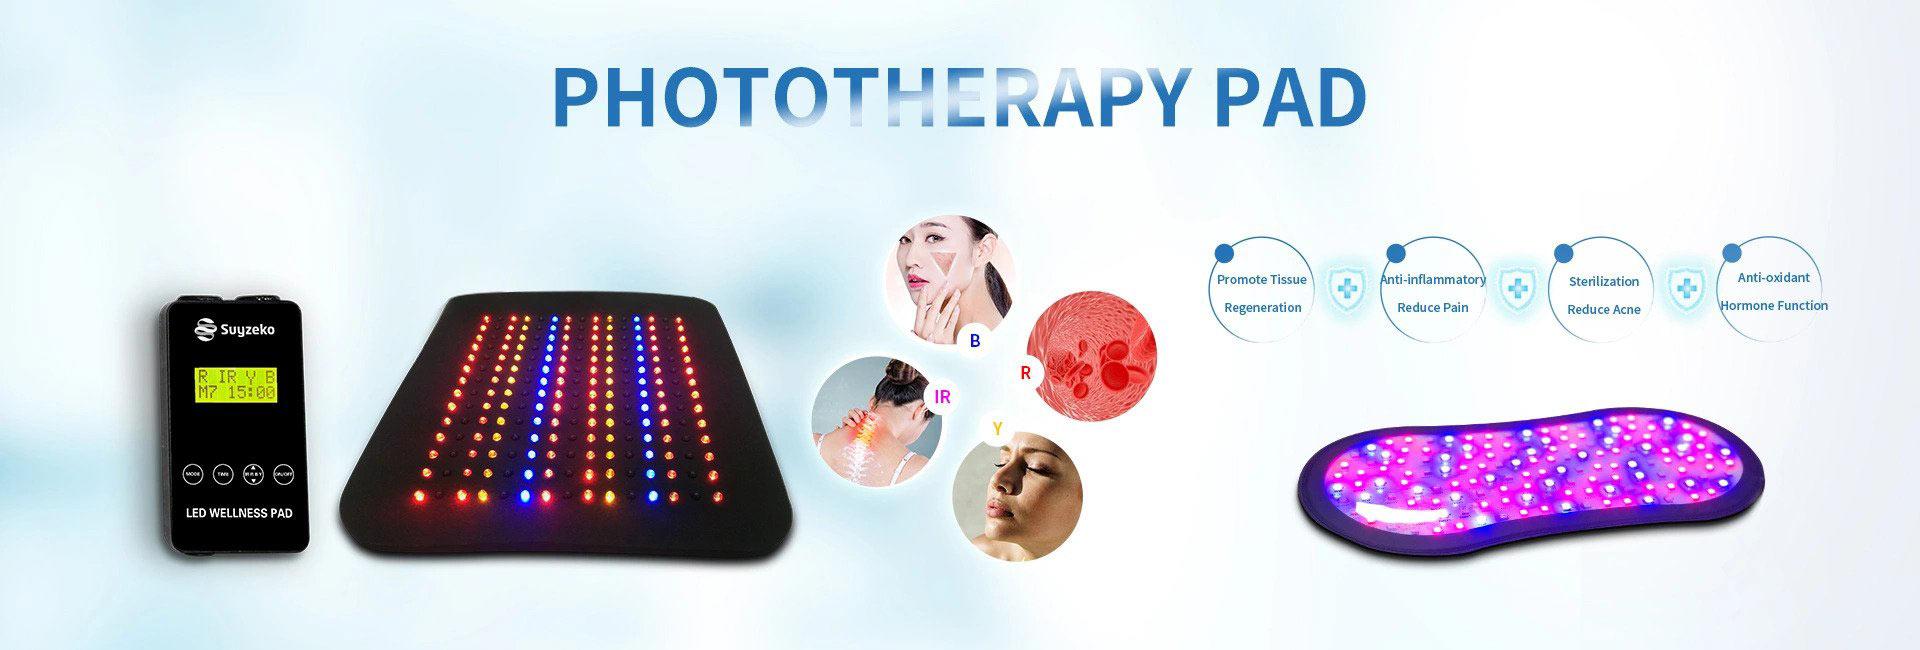 lighttherapymachine_slide4